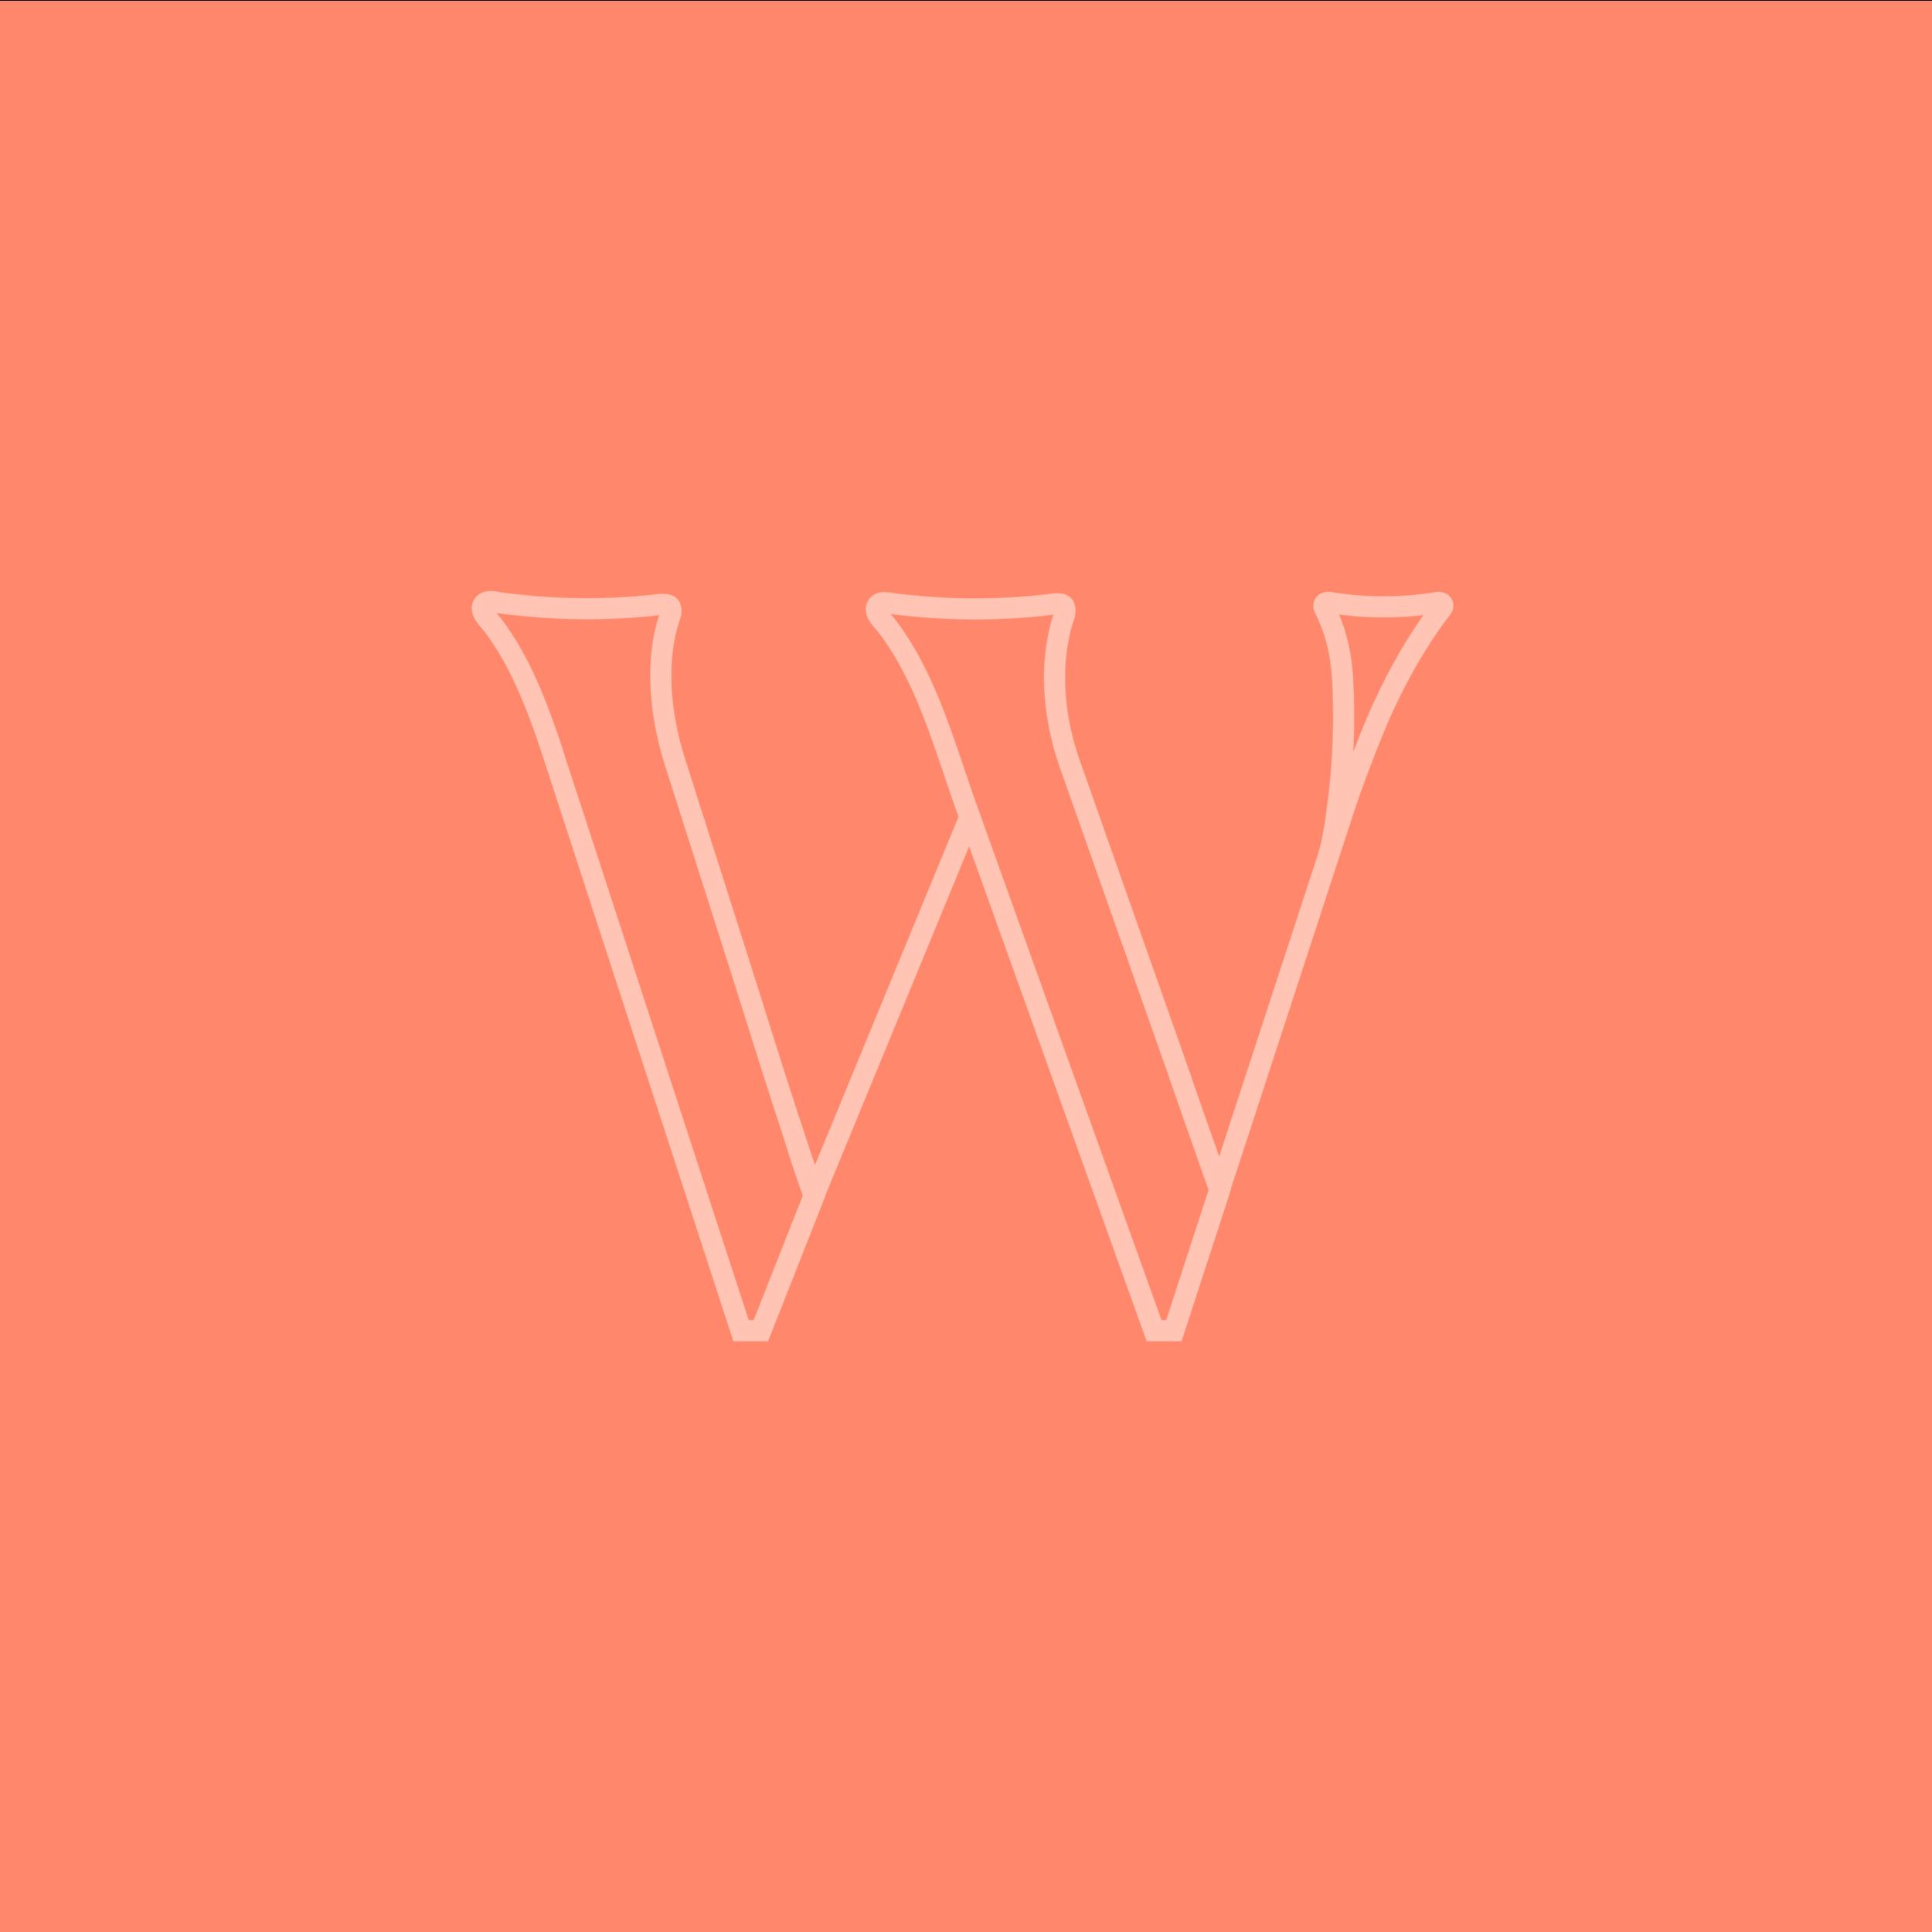 caley-adams-wildes-district-insta-posts-01.png